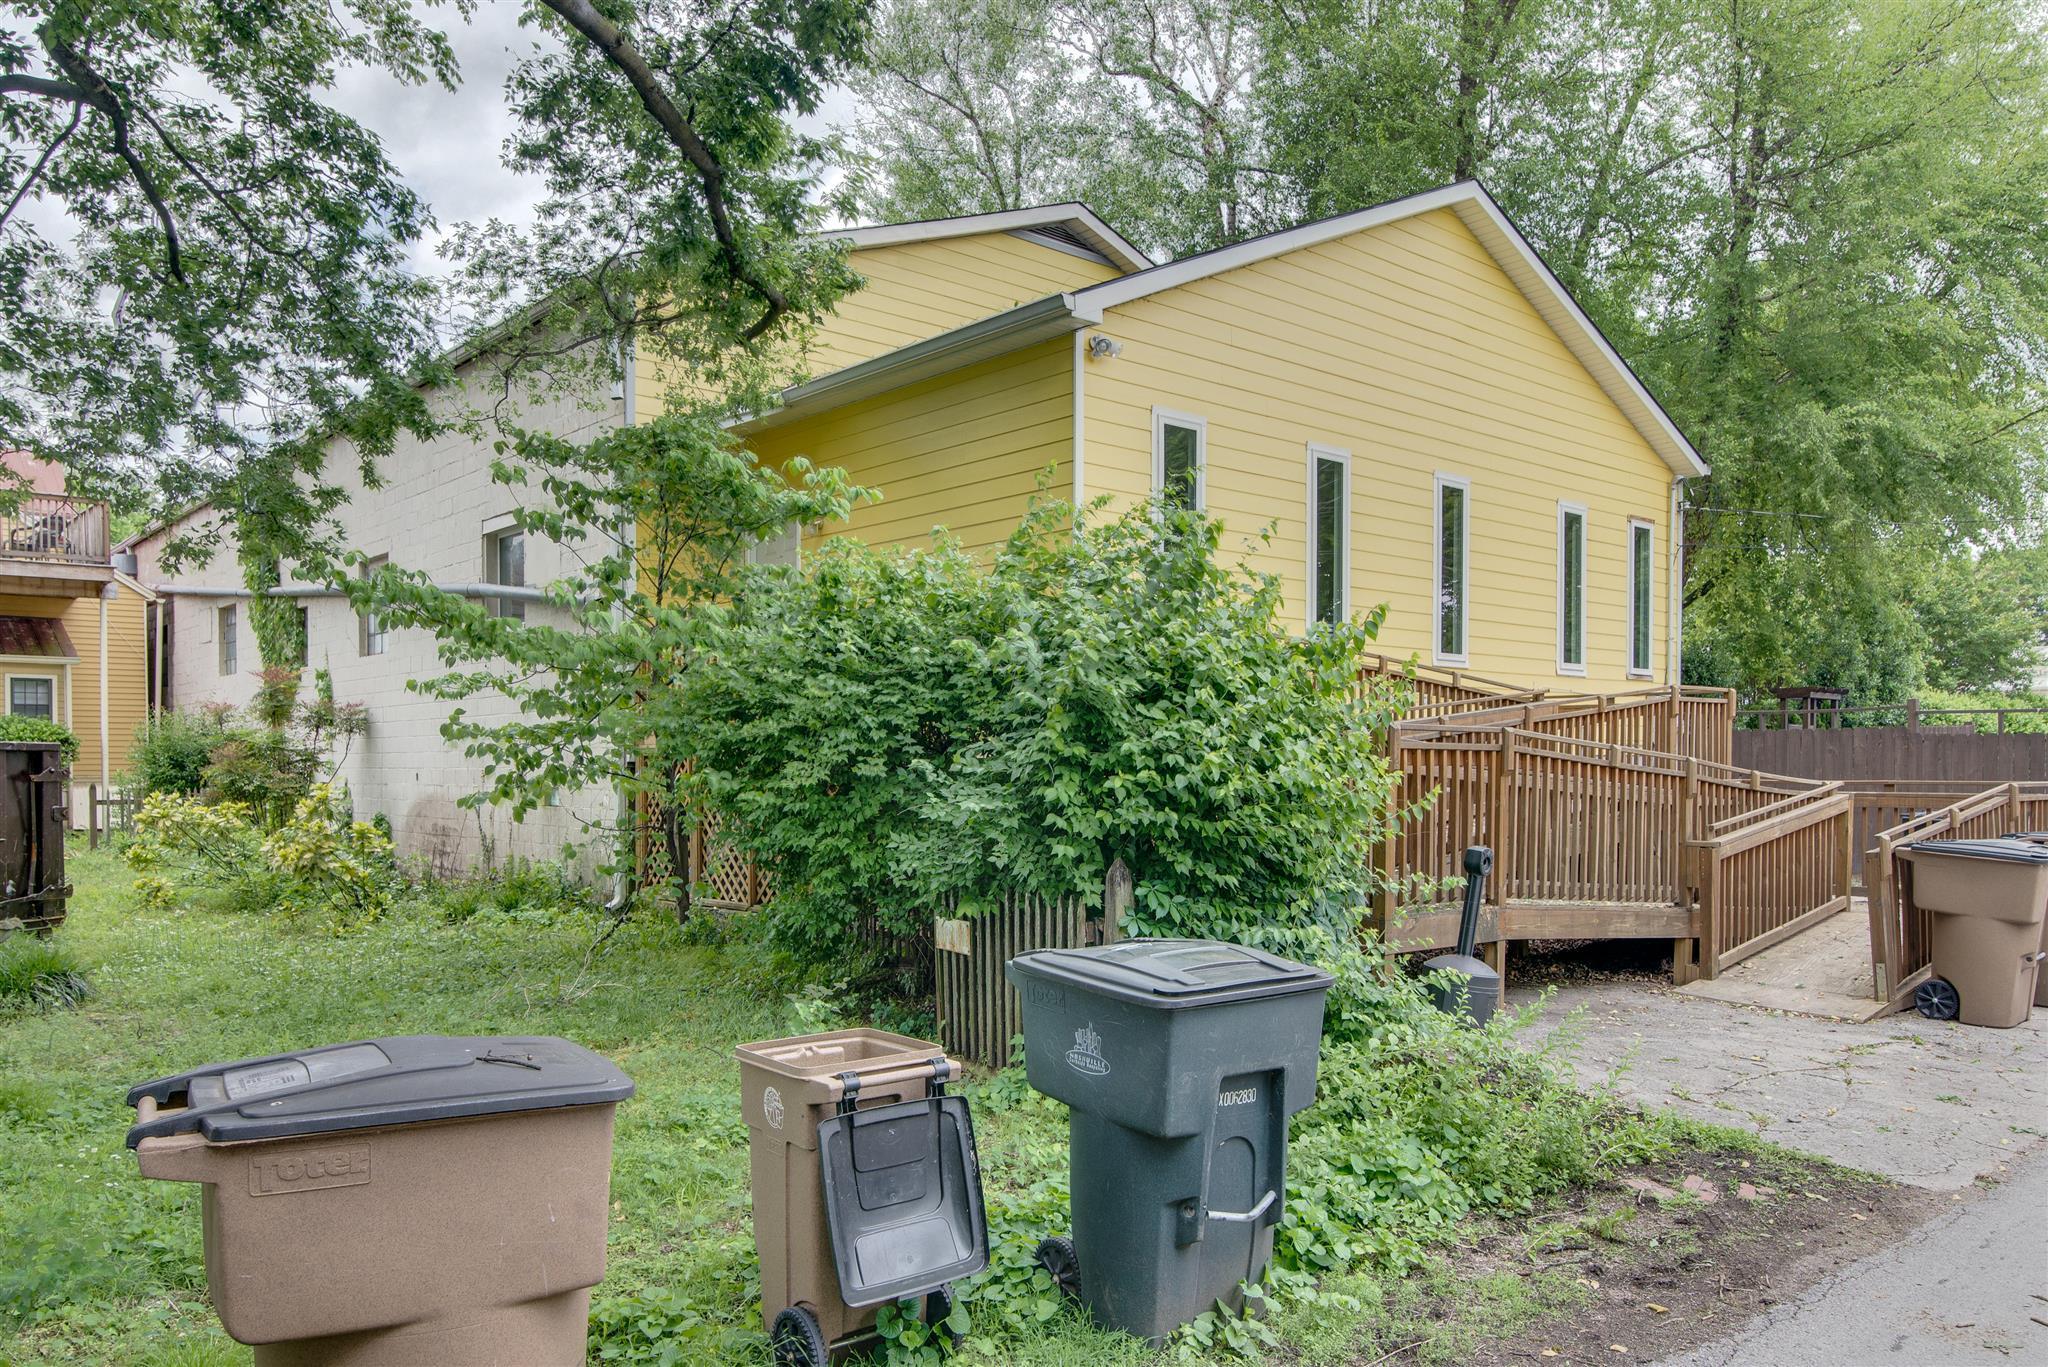 1220 6Th Ave N, Nashville, TN 37208 - Nashville, TN real estate listing